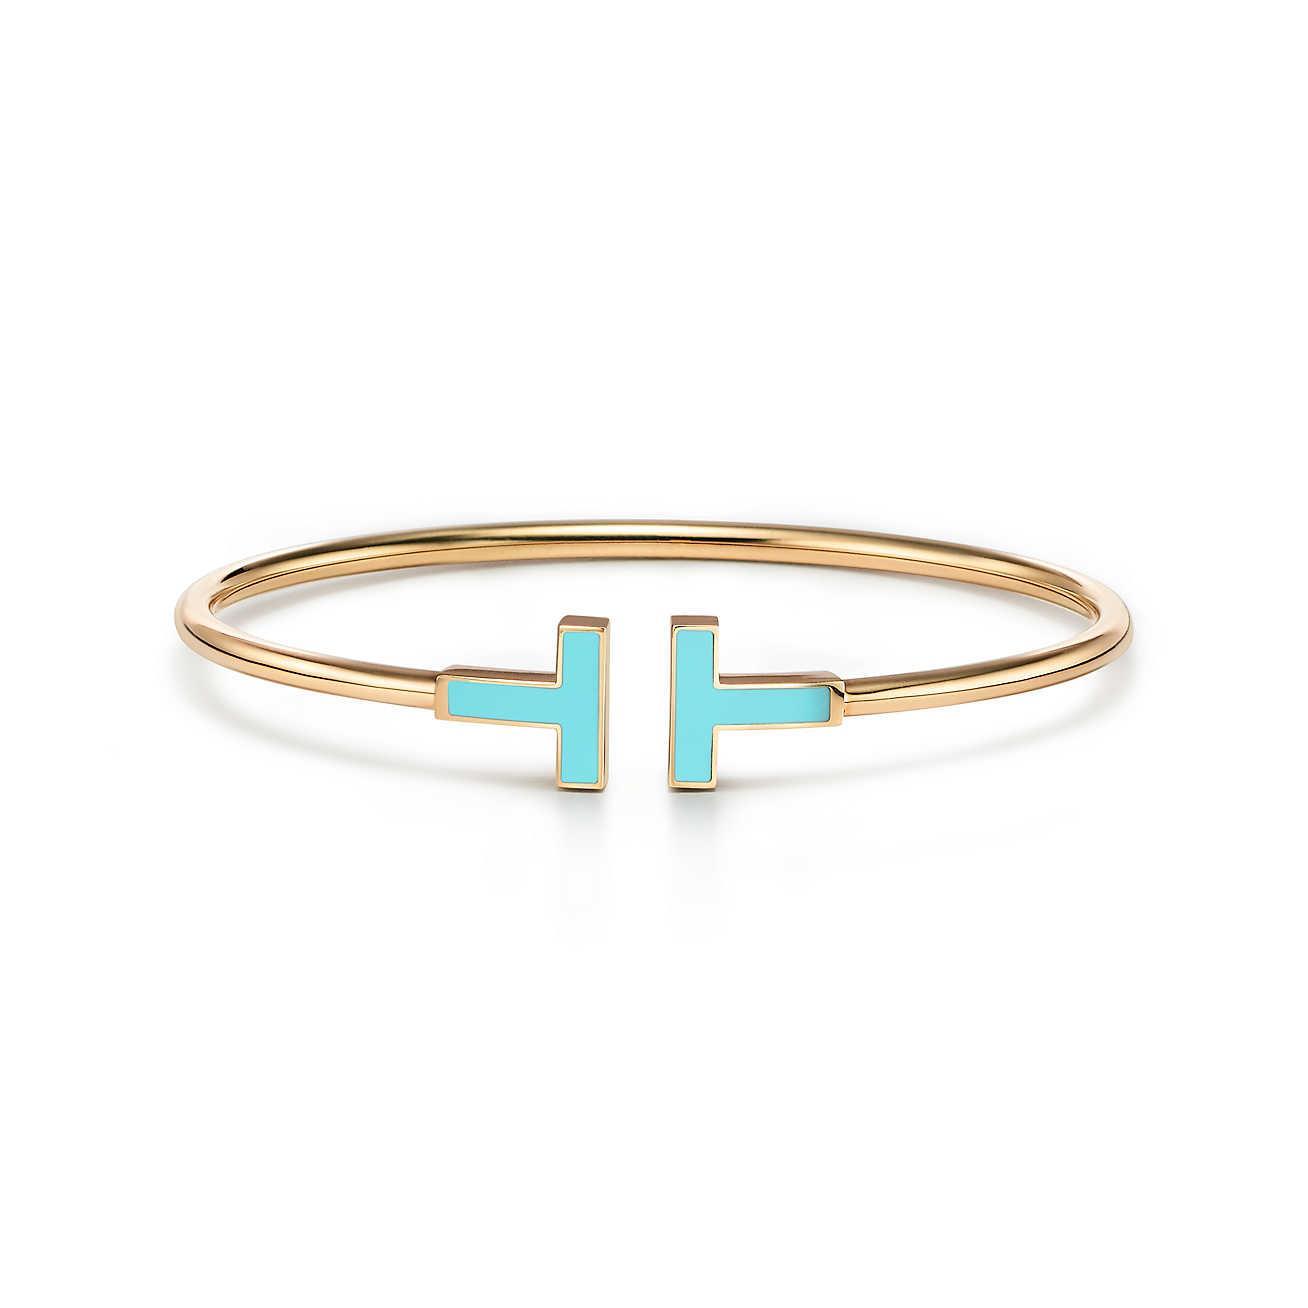 Tiffany T turquoise wire bracelet in 18k gold, medium